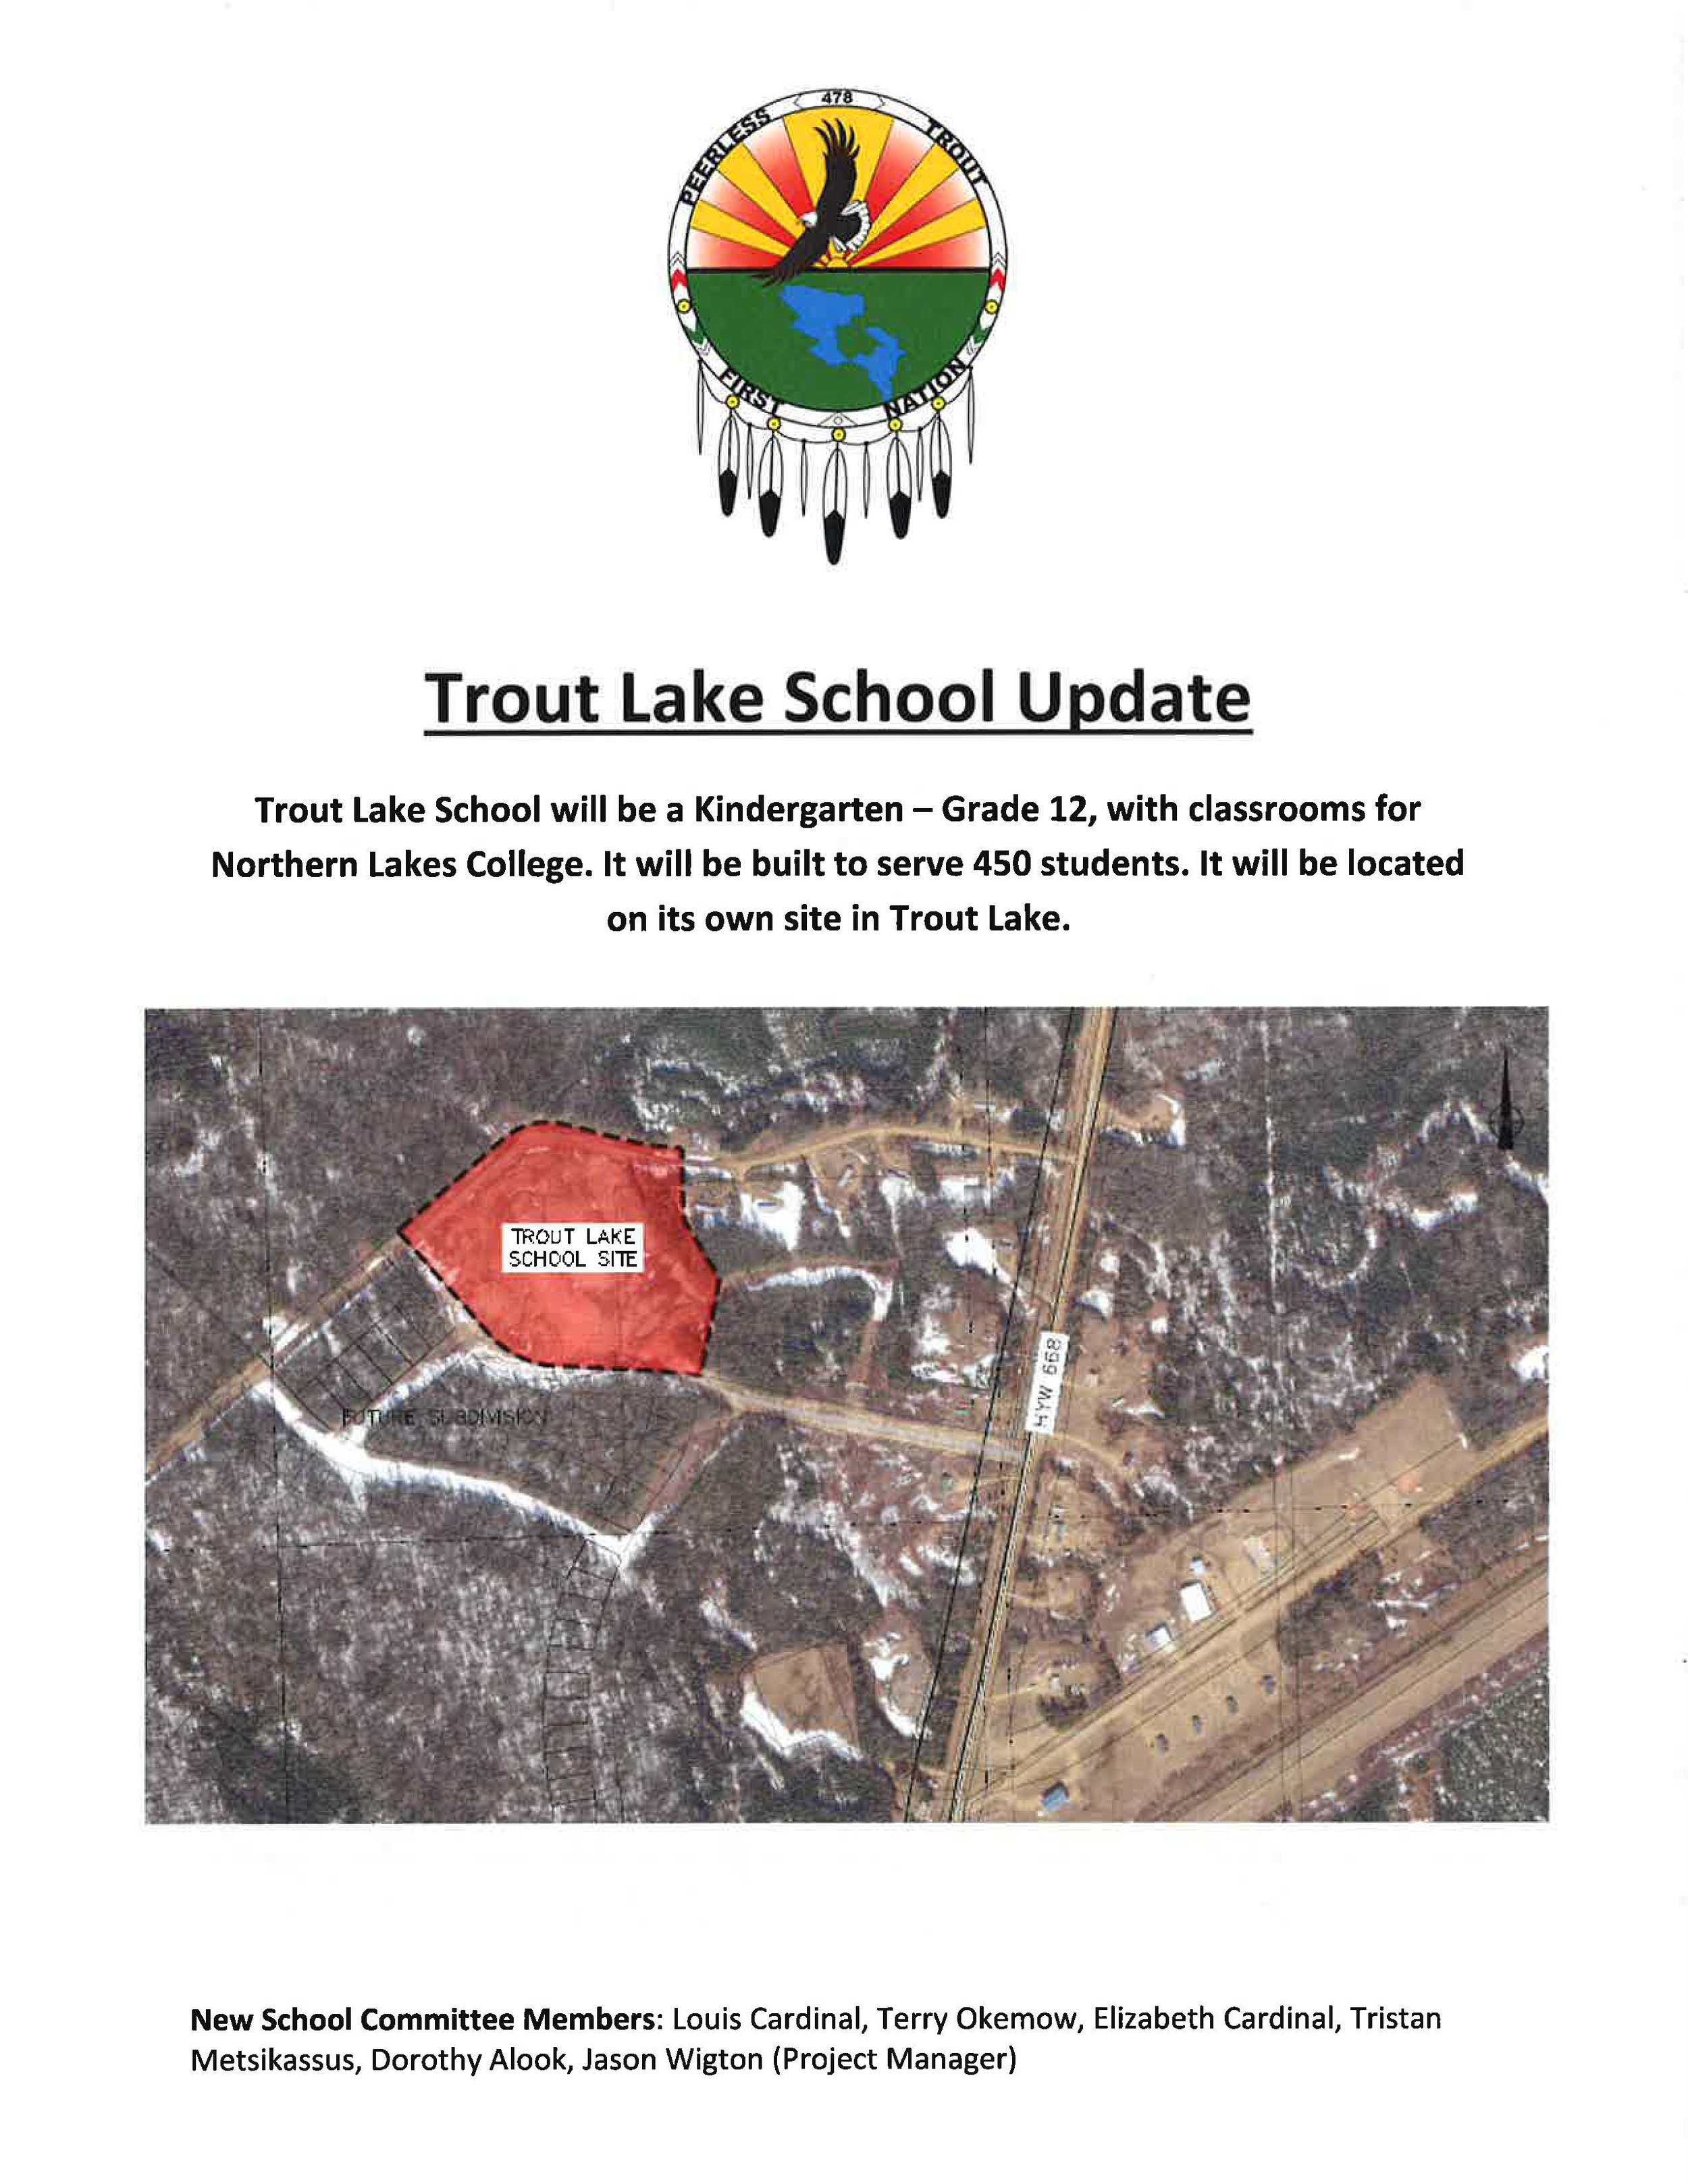 Trout Lake School Update.jpg